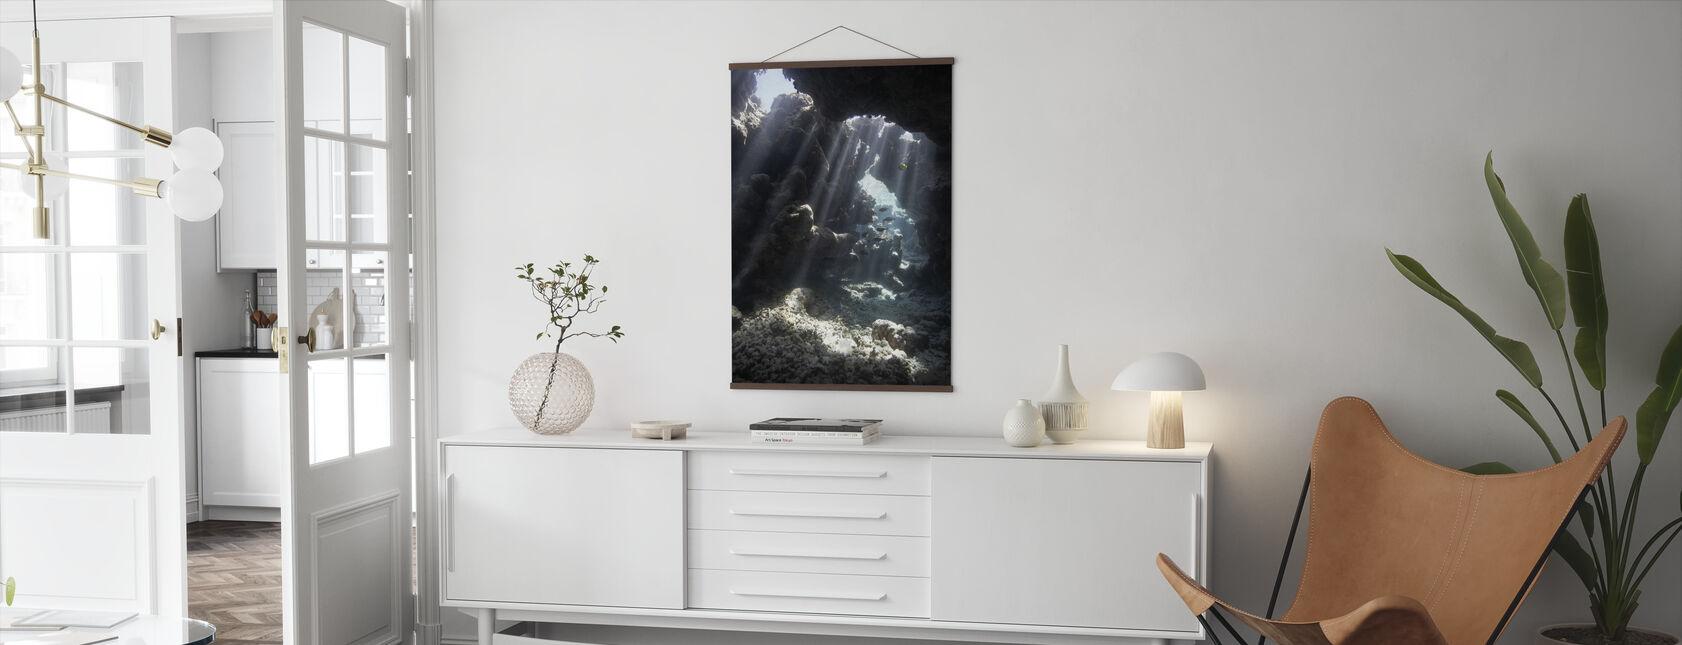 Sunbeams through Water - Poster - Living Room